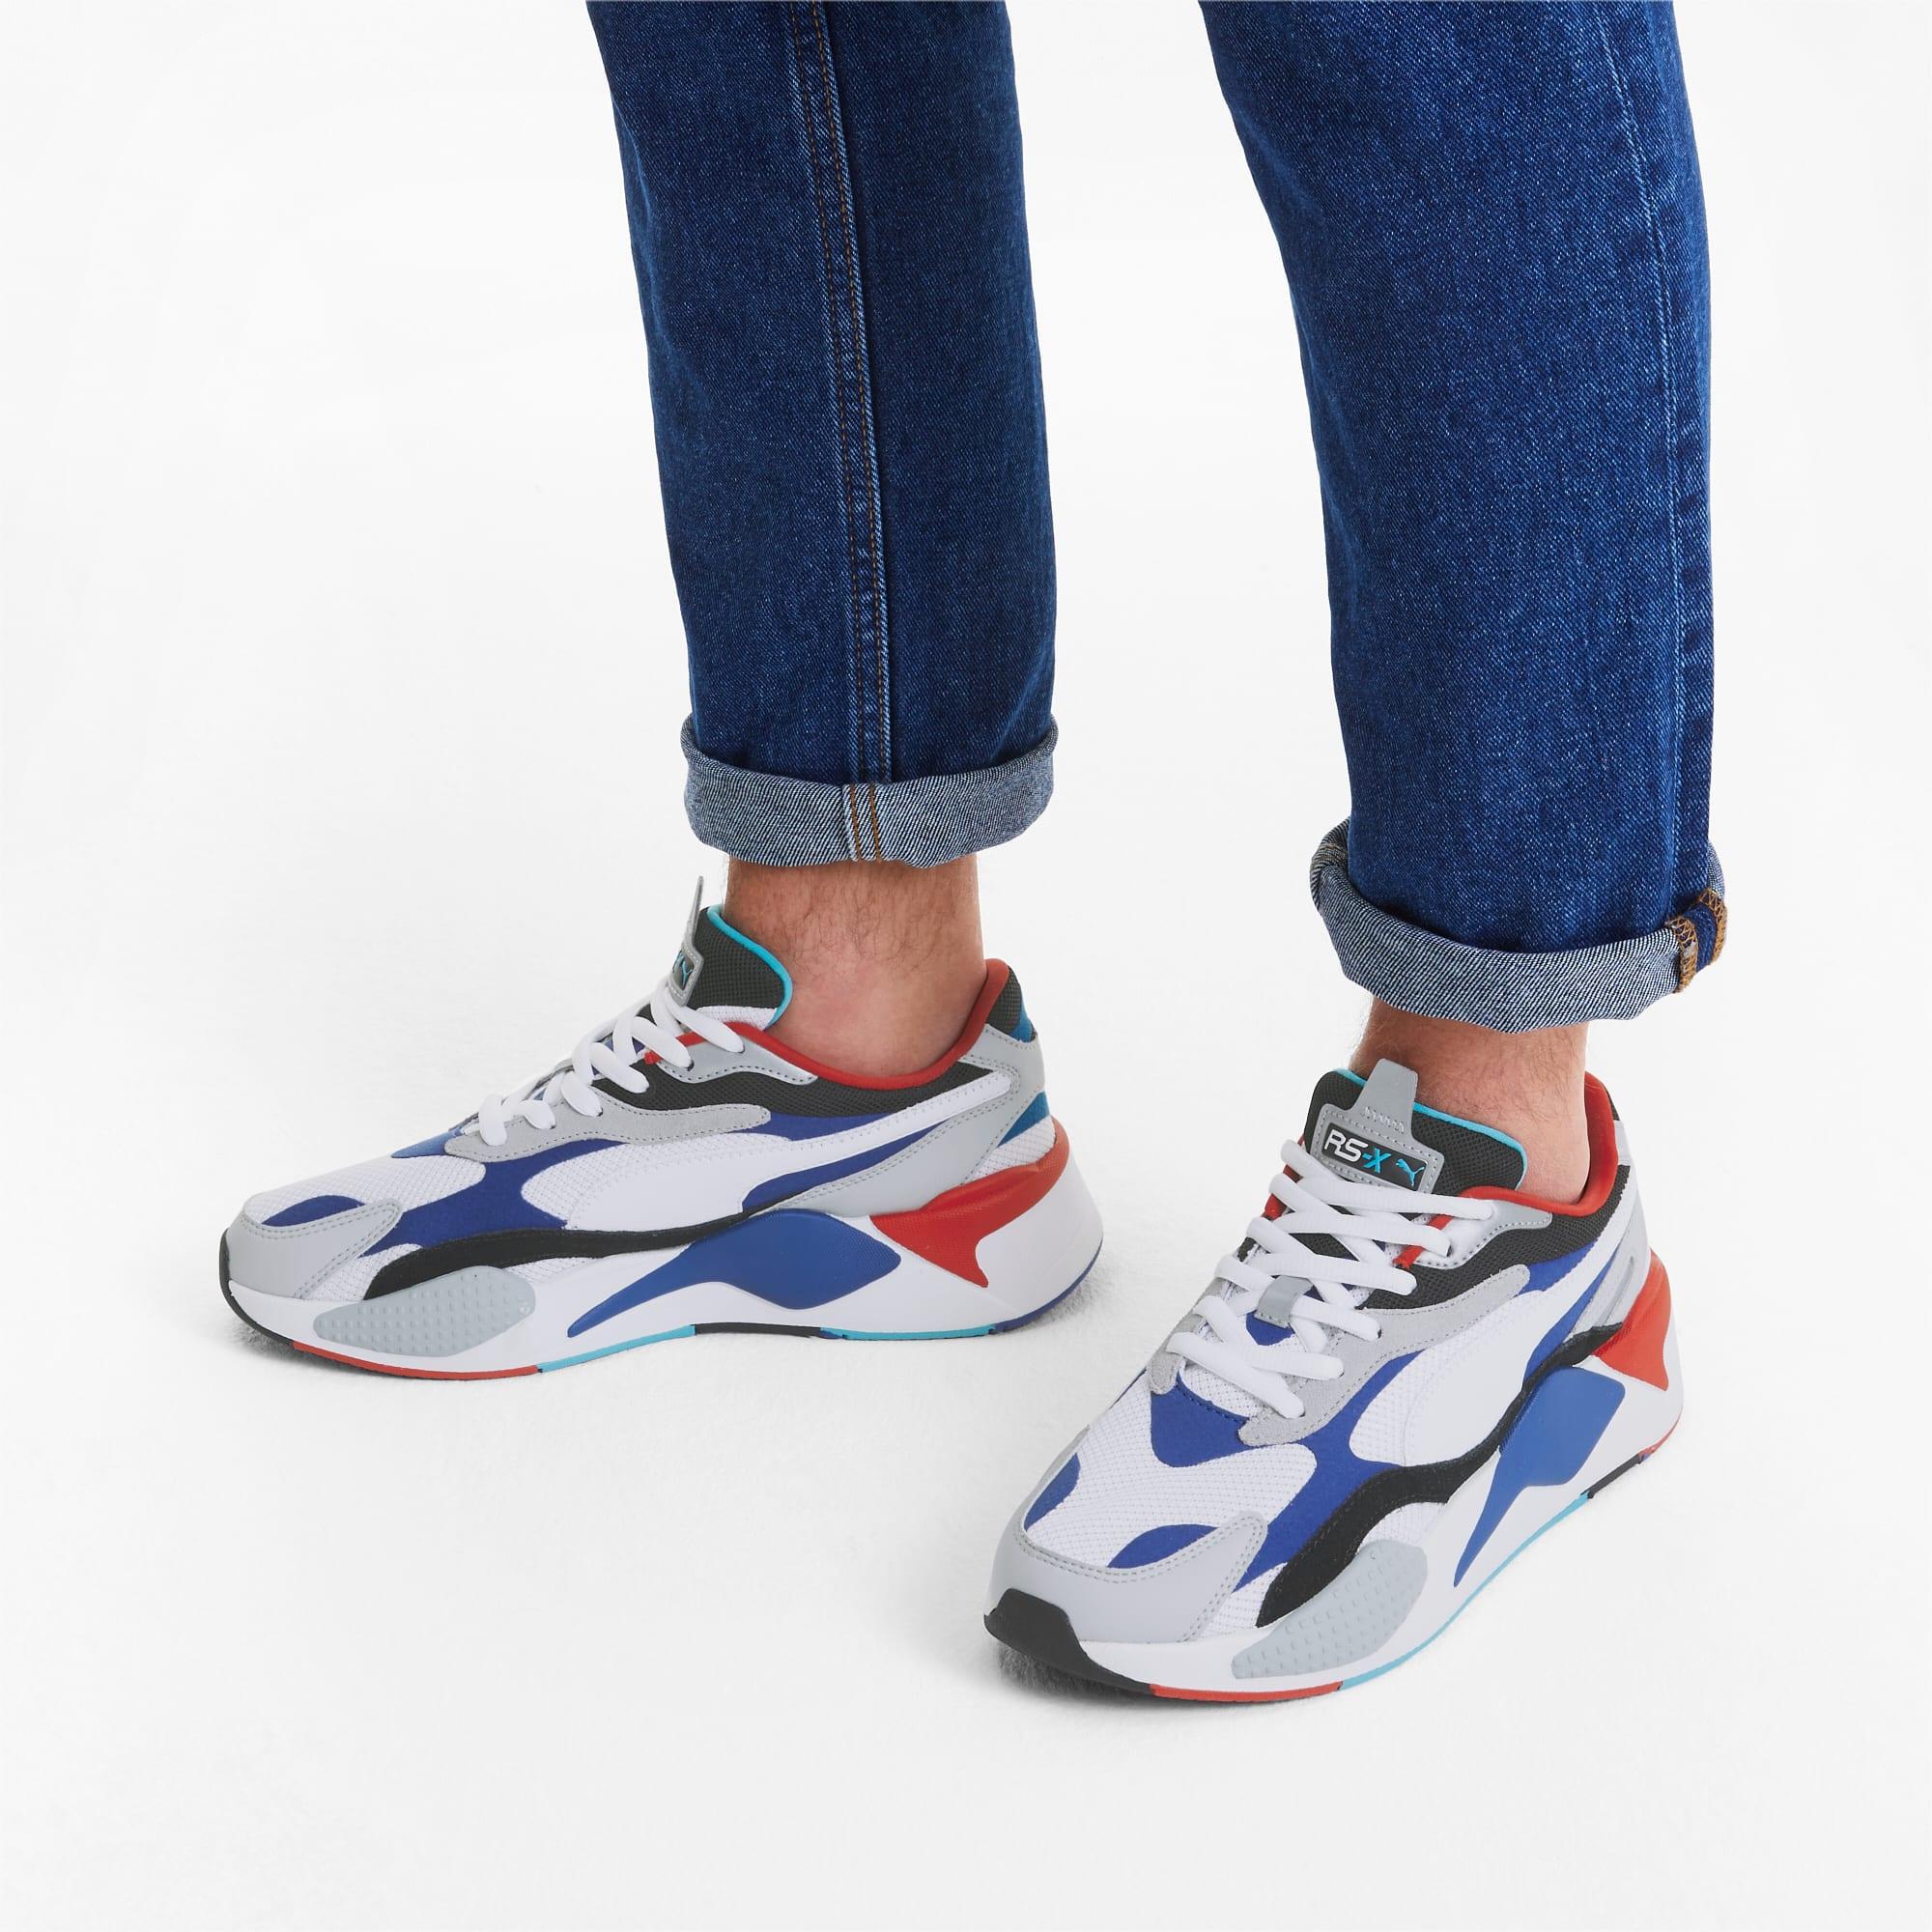 RS X3 Puzzle Men's Sneakers